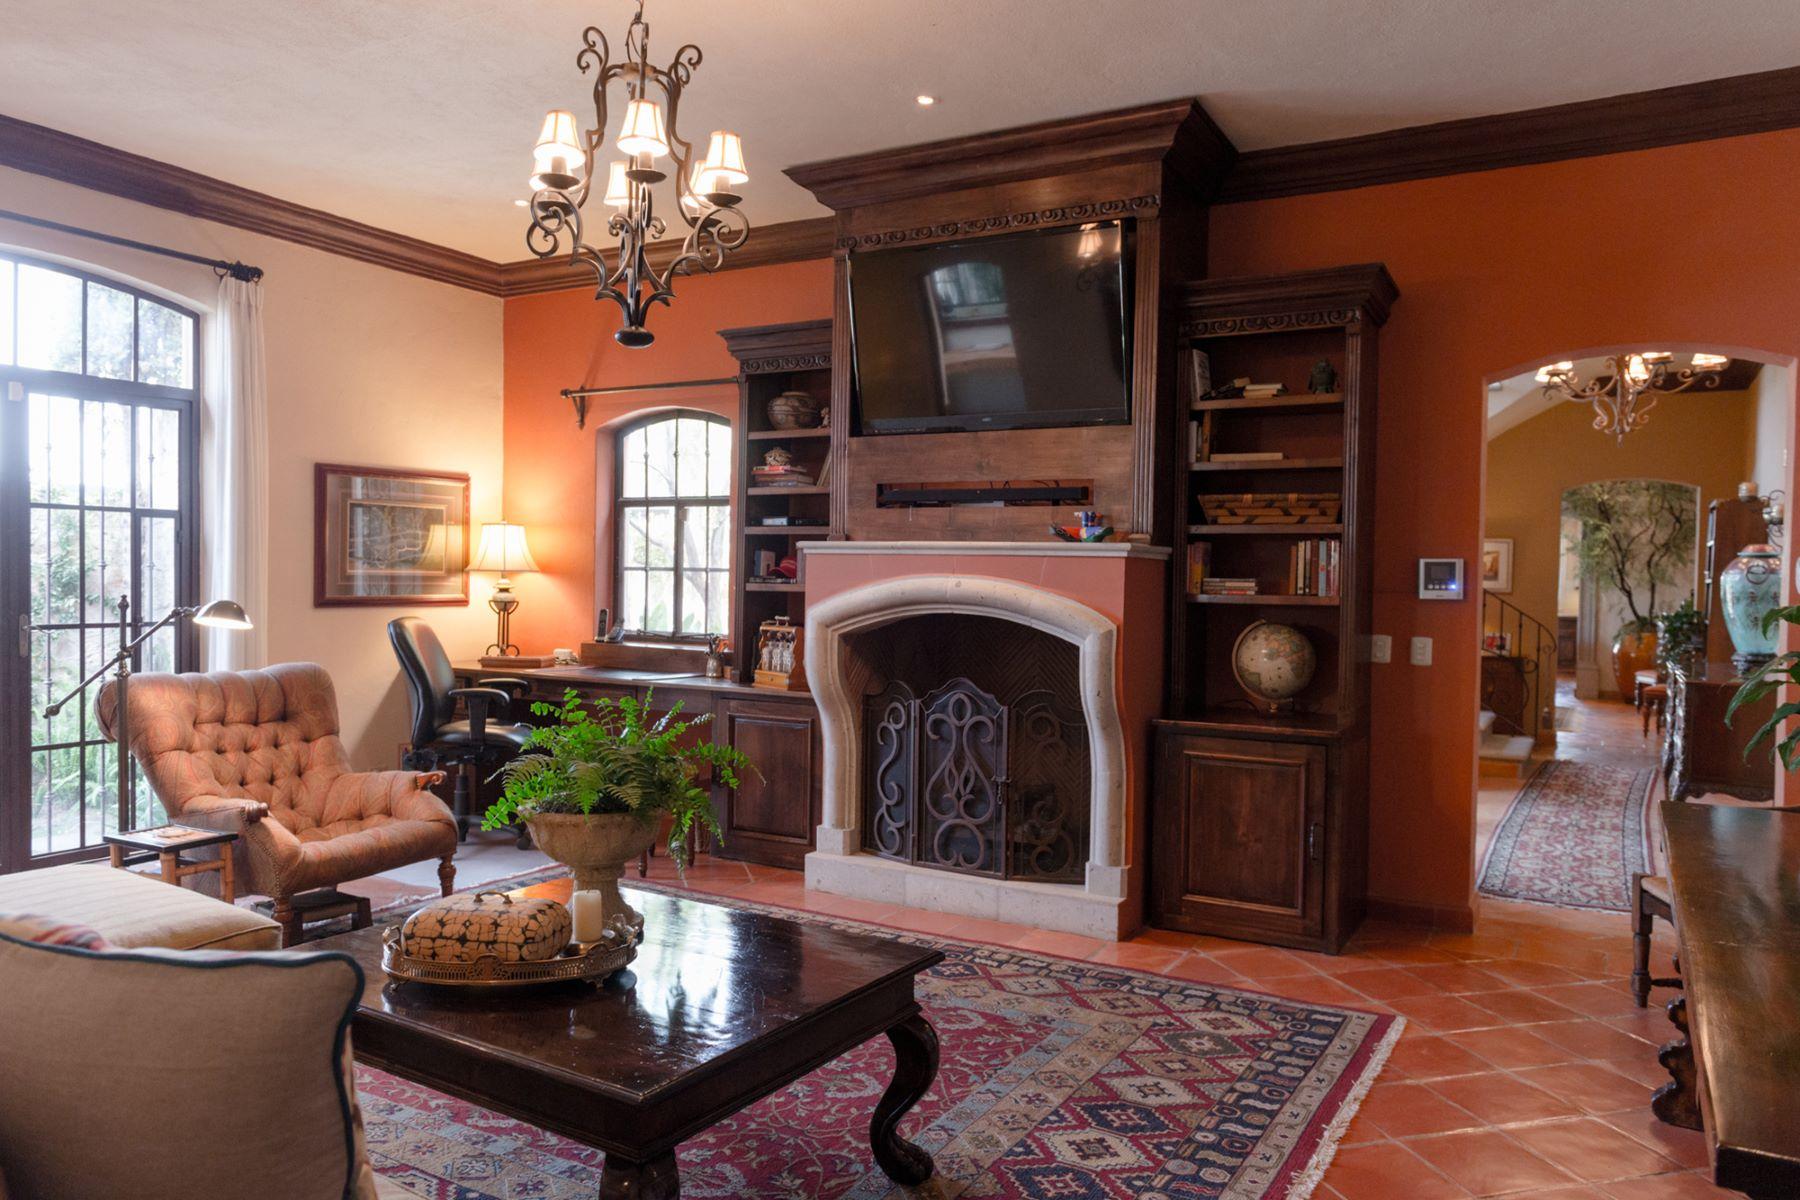 Additional photo for property listing at CASA LA QUINTA San Miguel De Allende, Guanajuato México